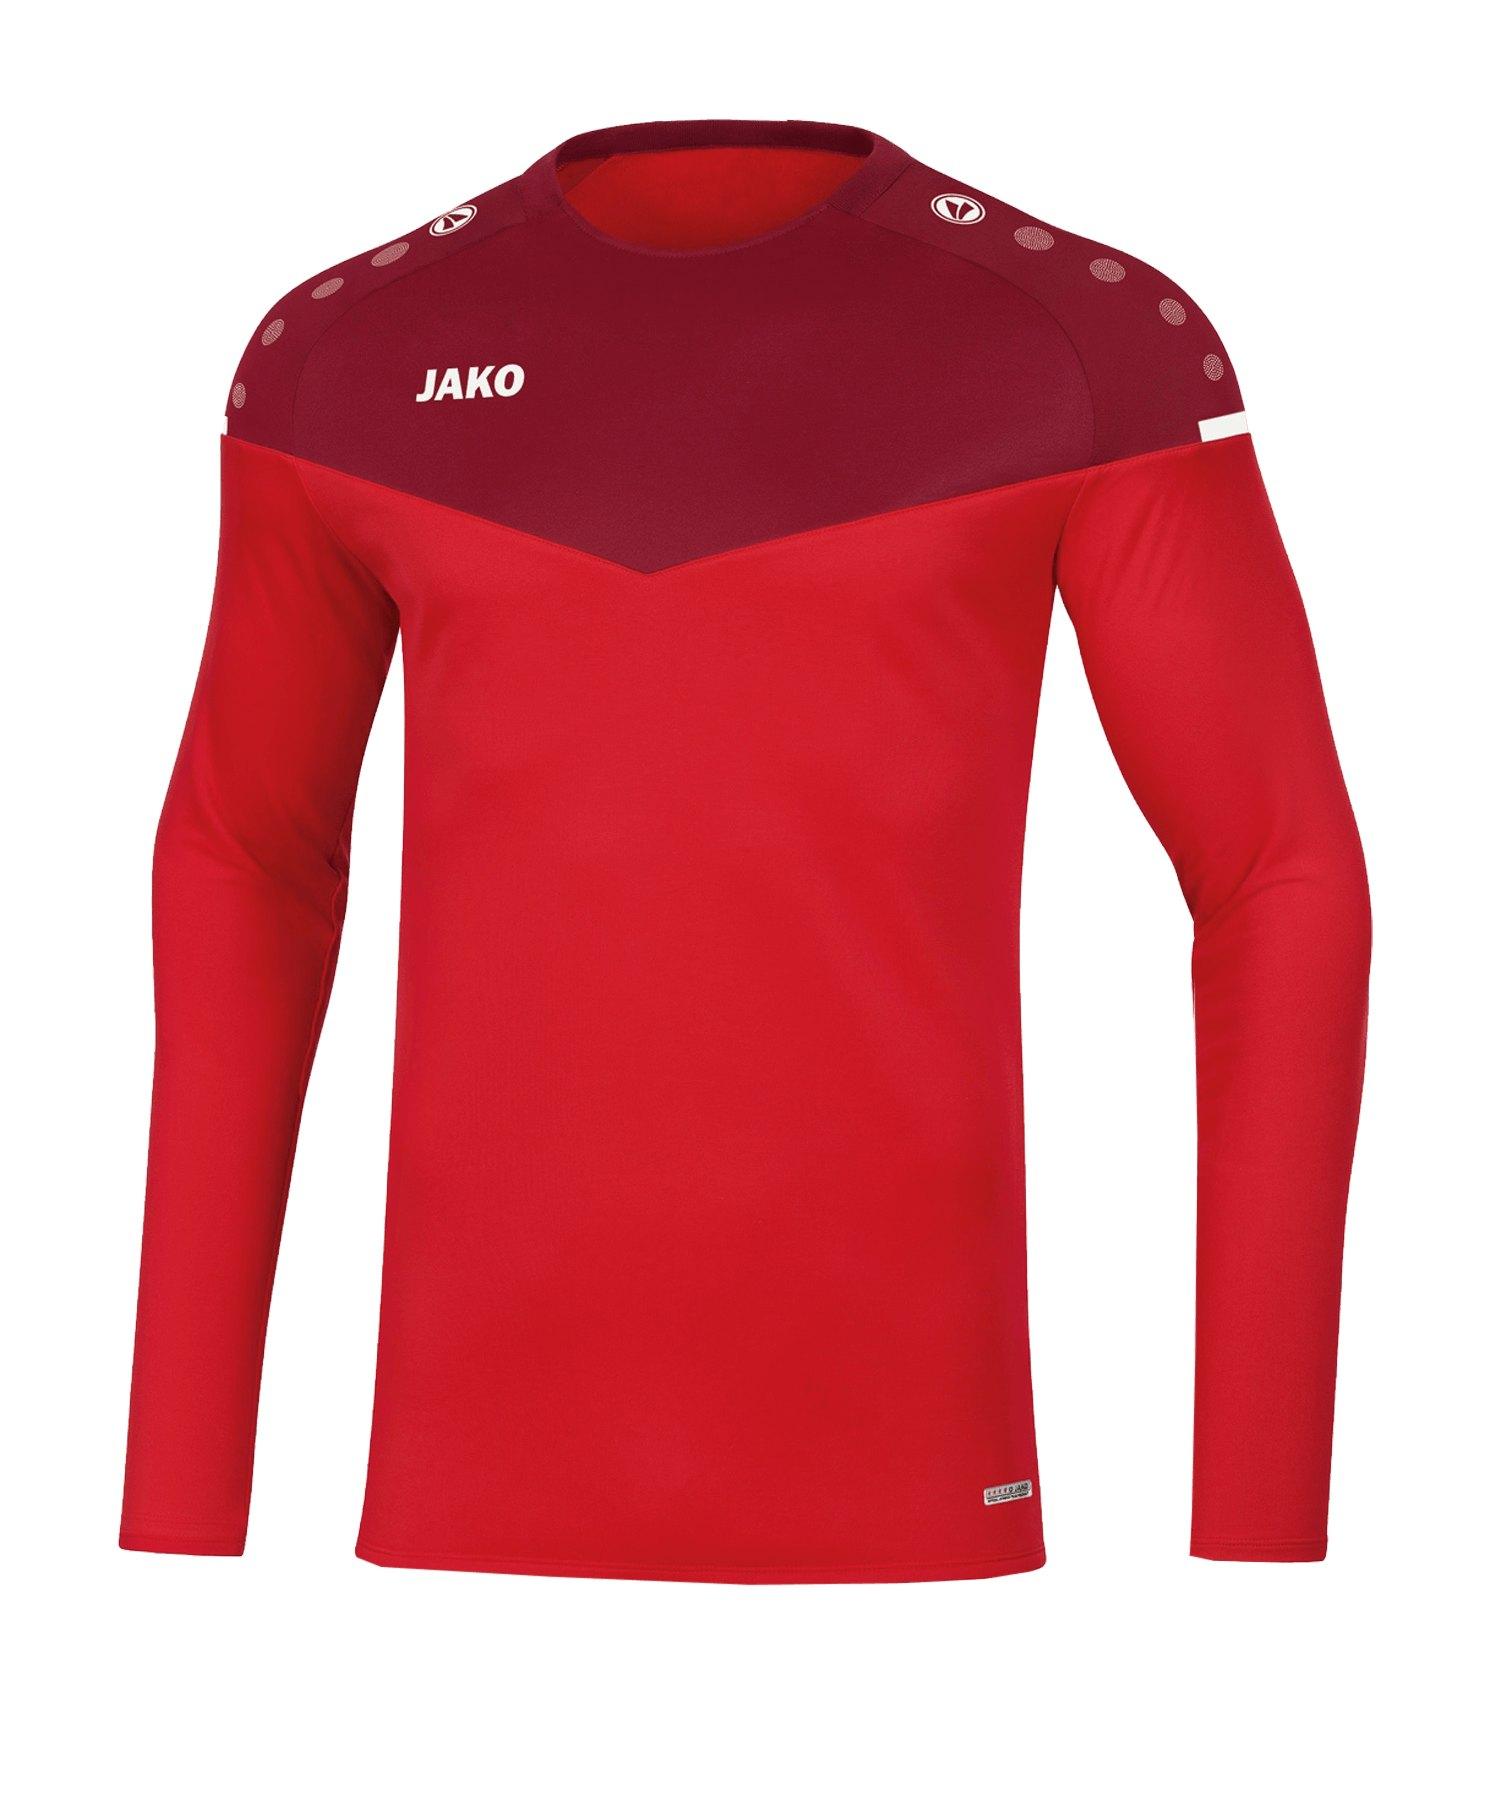 Jako Champ 2.0 Sweatshirt Rot F01 - rot